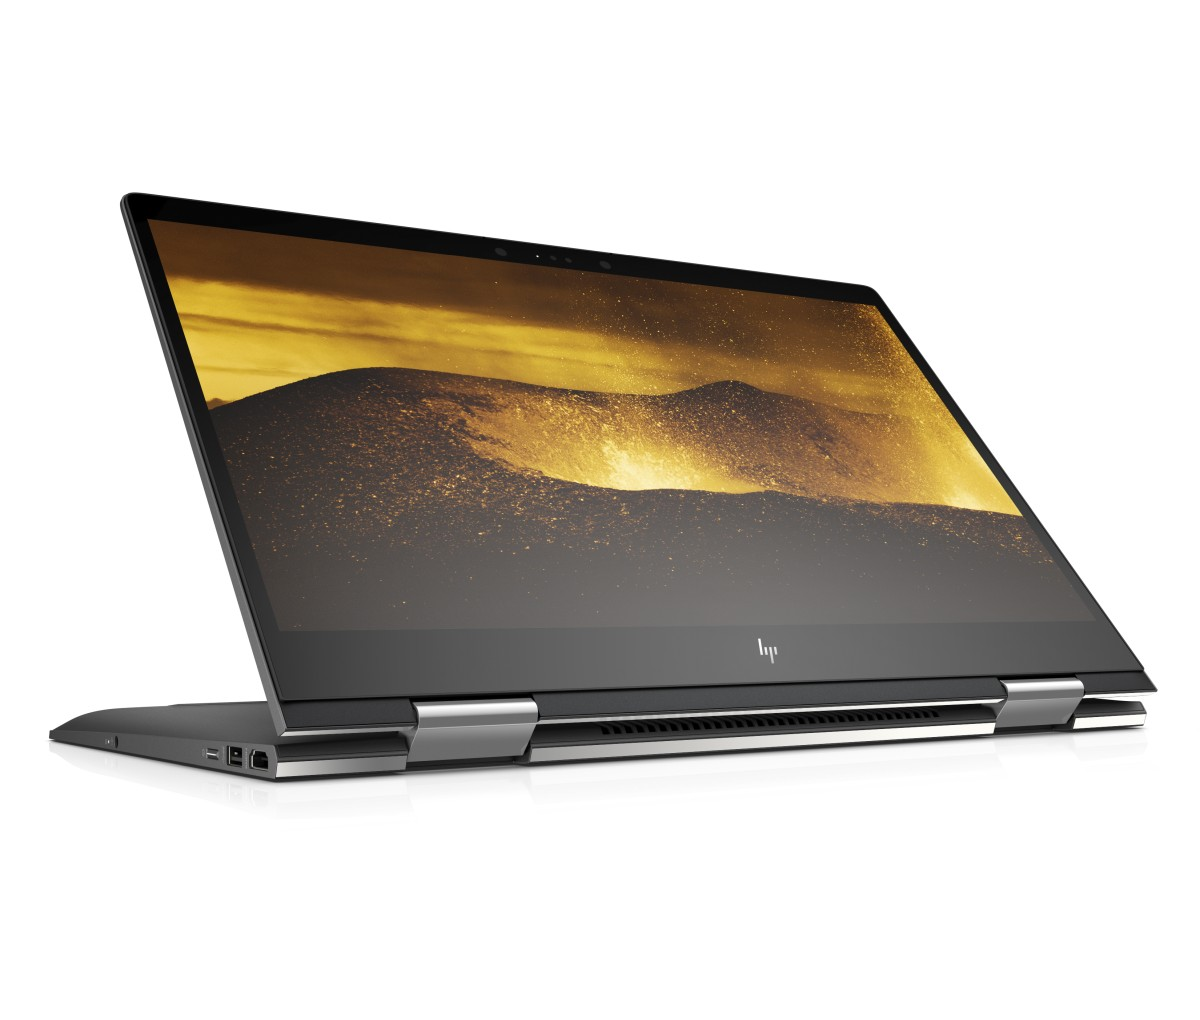 HP Envy 15 x360-bq004nc A12-9720P FHD/8GB/256SSD+1TB/W10 Natural silver